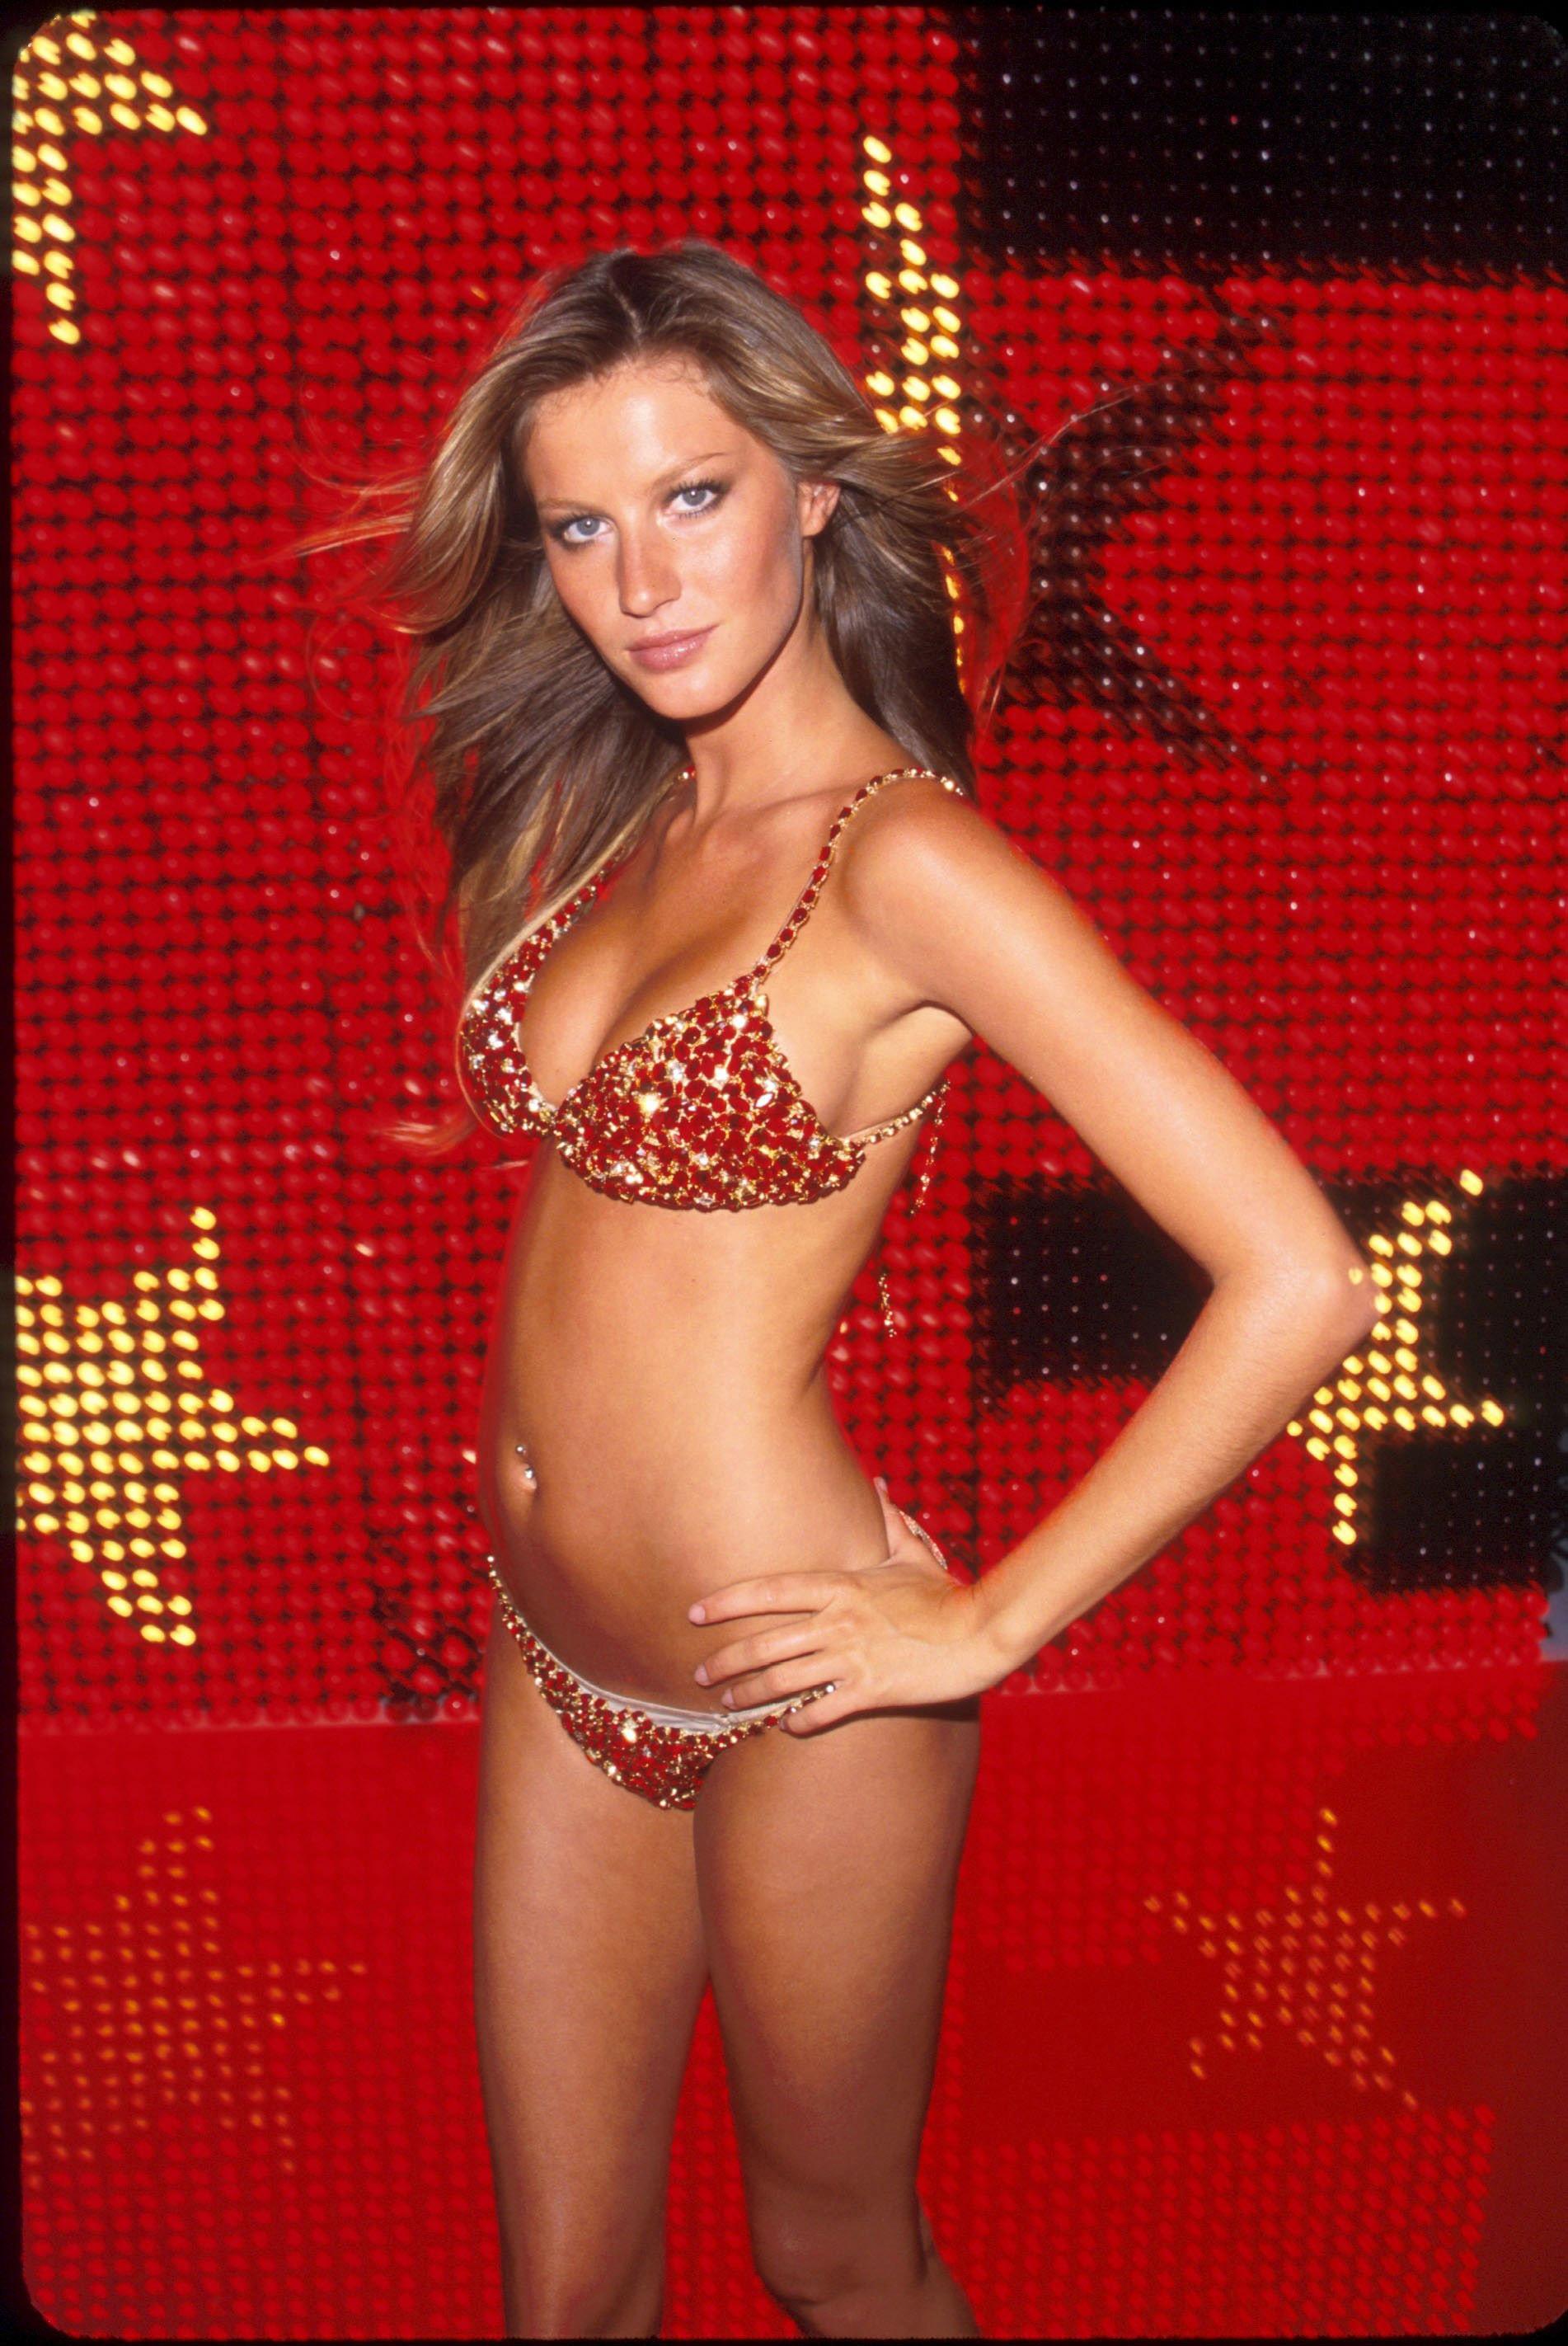 Gisele Bundchen ruby bikini